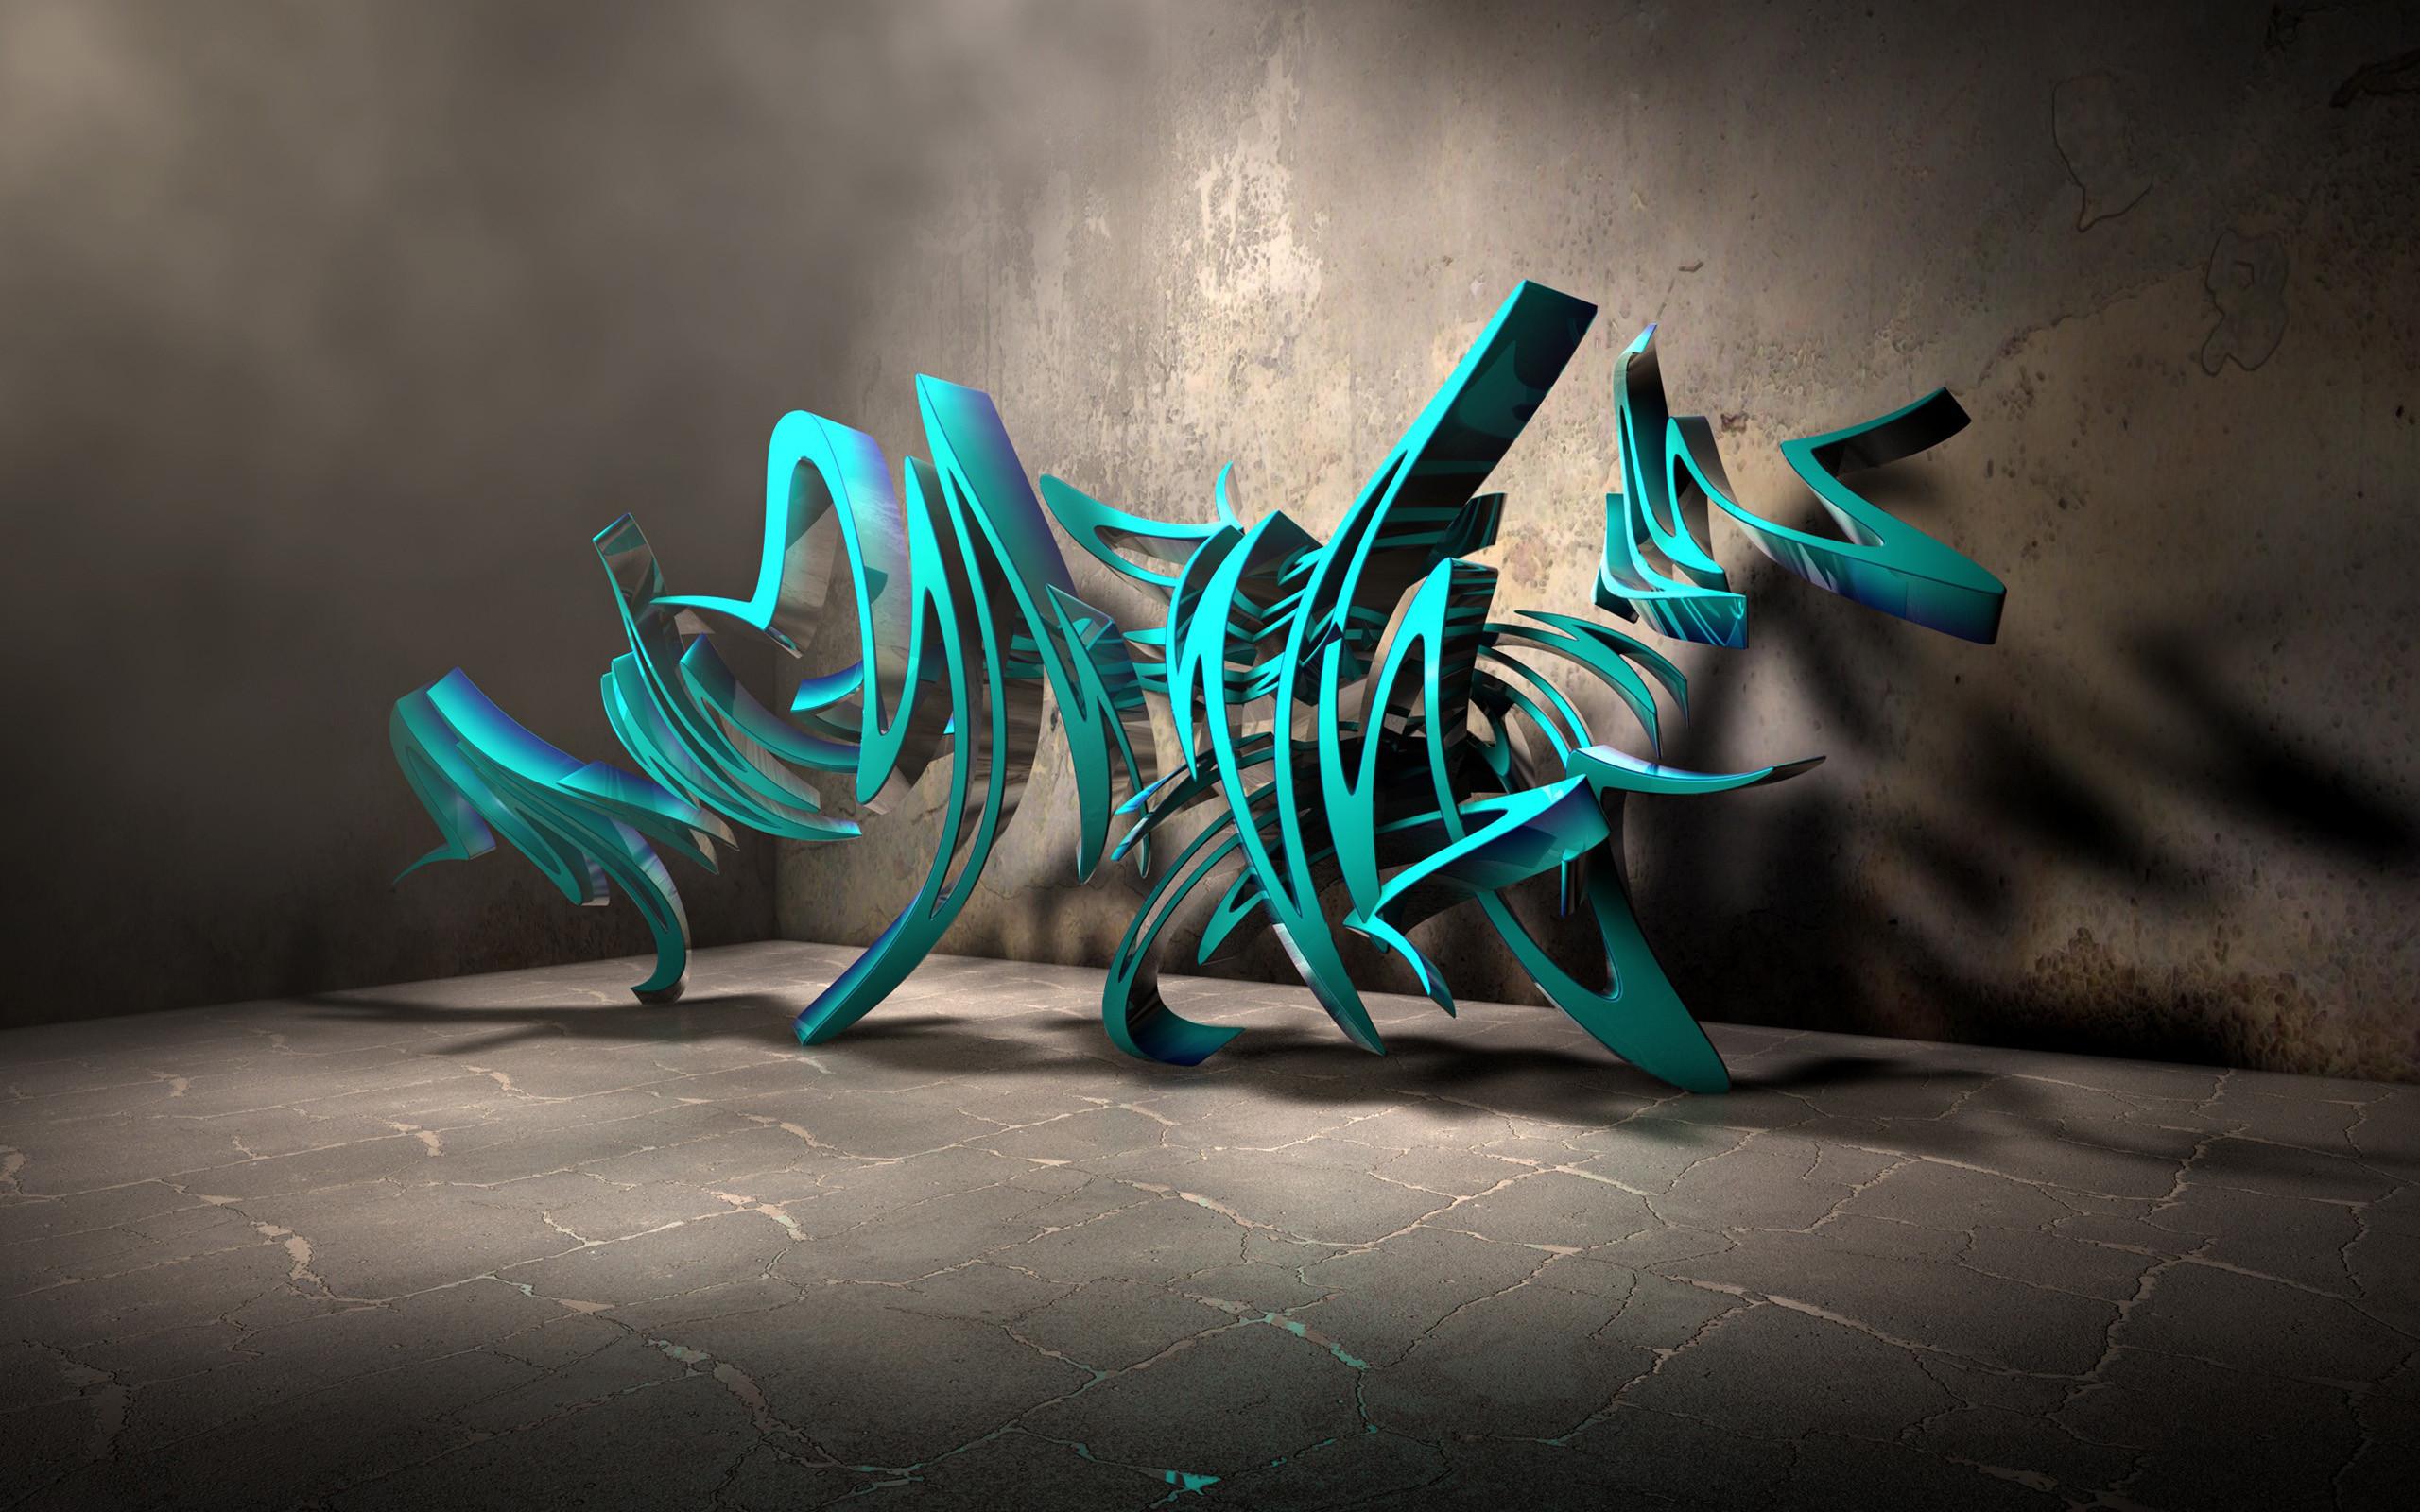 Pinterest Abstract Graffiti Wallpaper Abstract Graffiti Wallpaper –  Wallpapersafari …